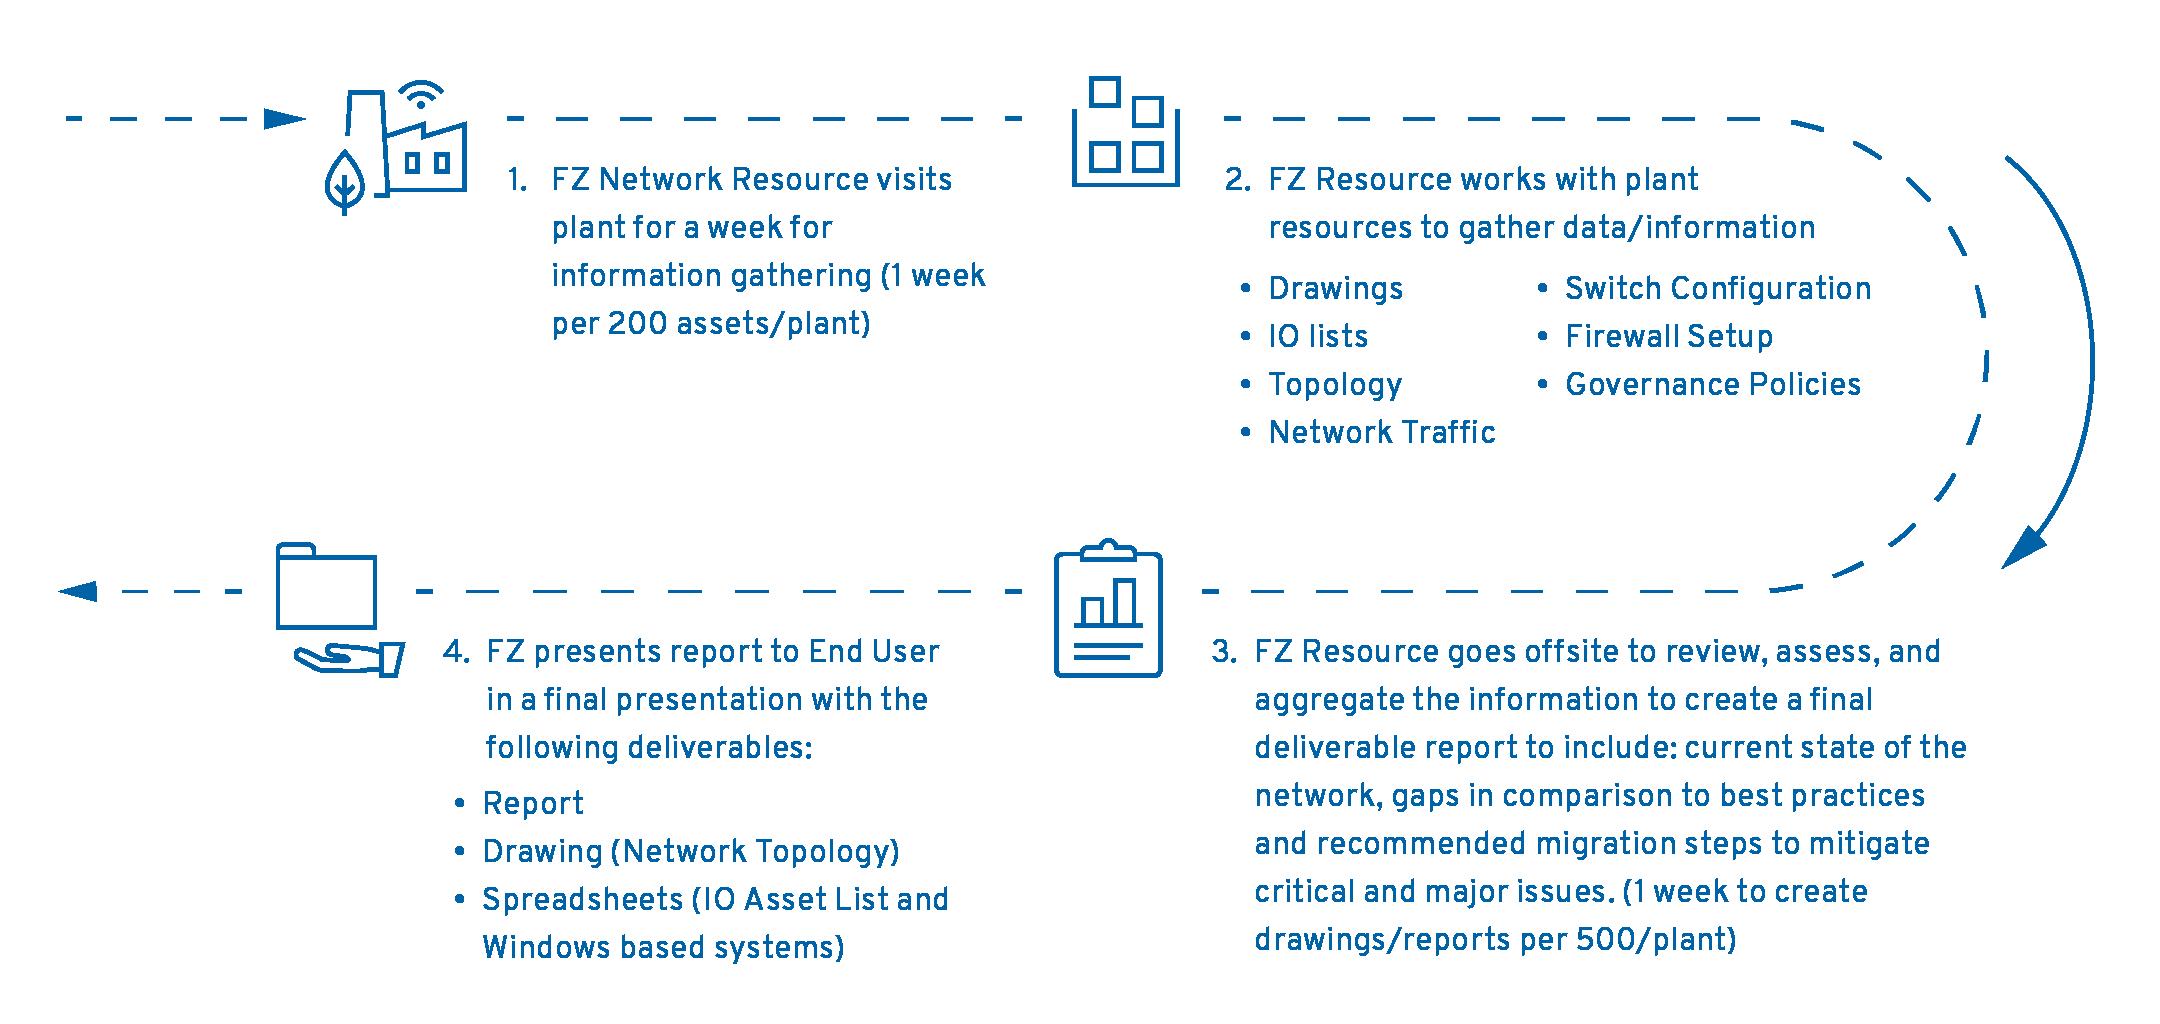 Industrial Networking Customer Roadmap@4x